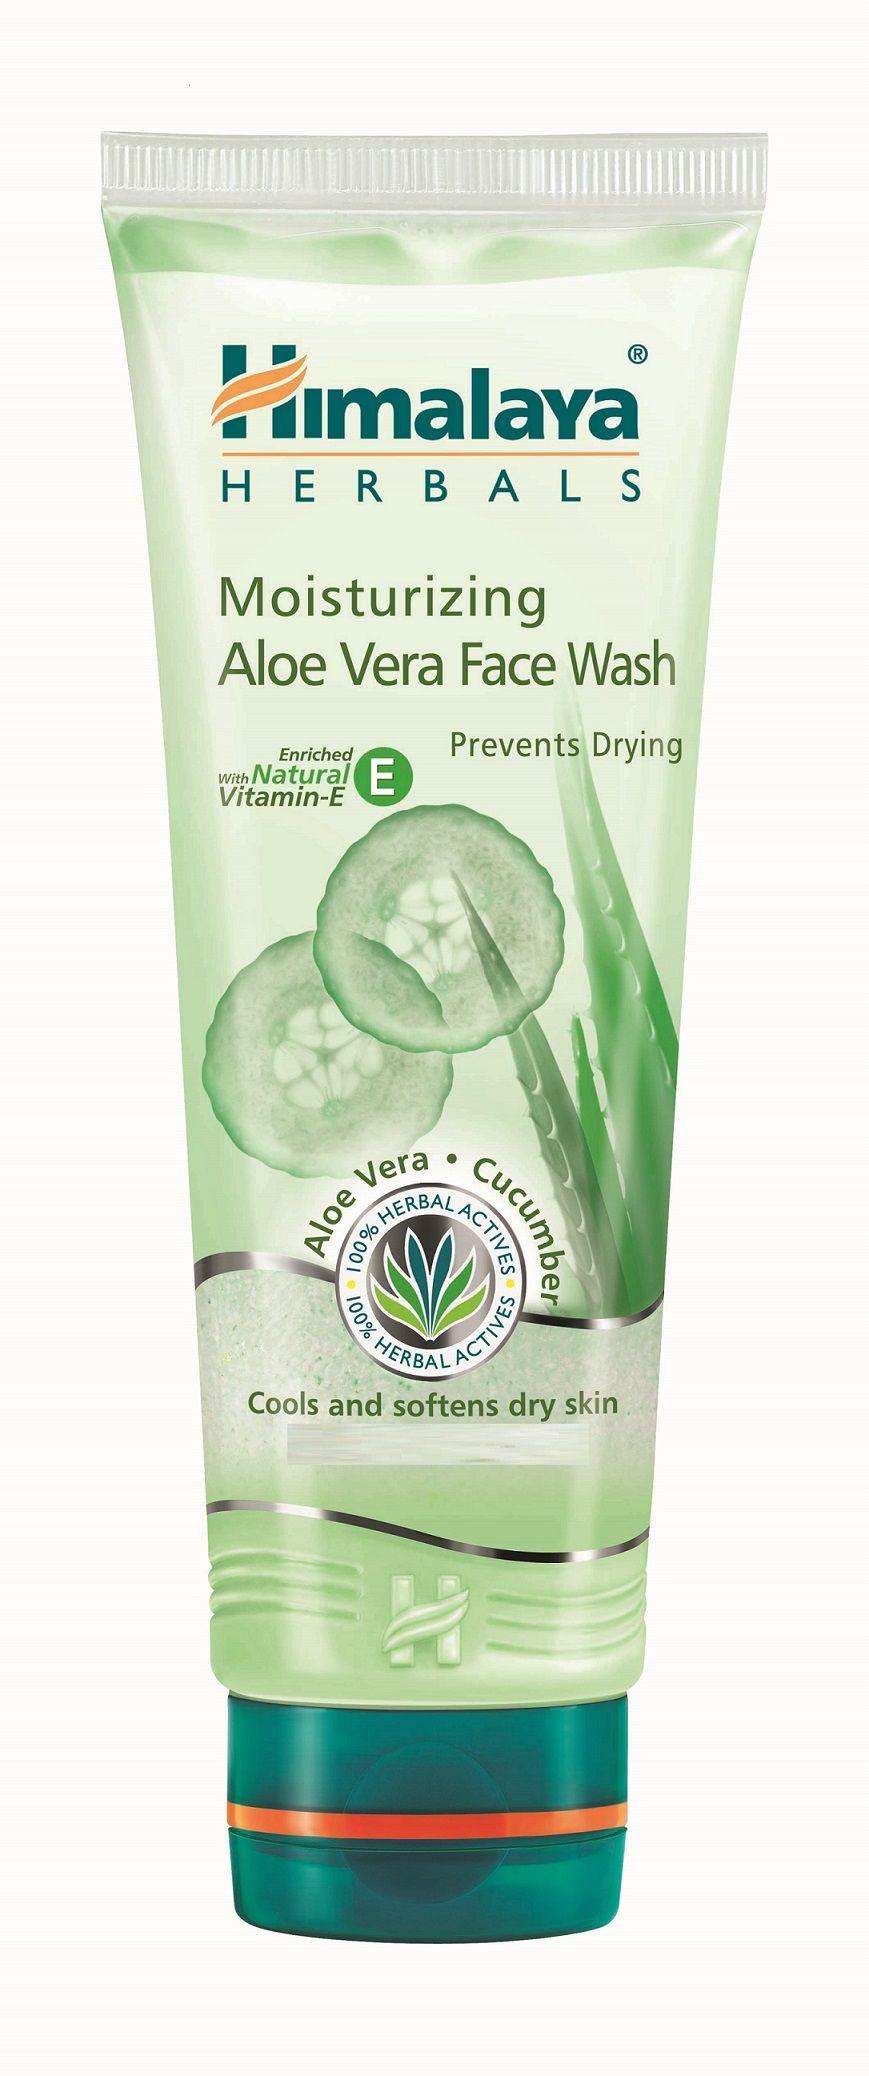 Himalaya Herbals Moisturizing Aloe Vera Face Wash 100ml